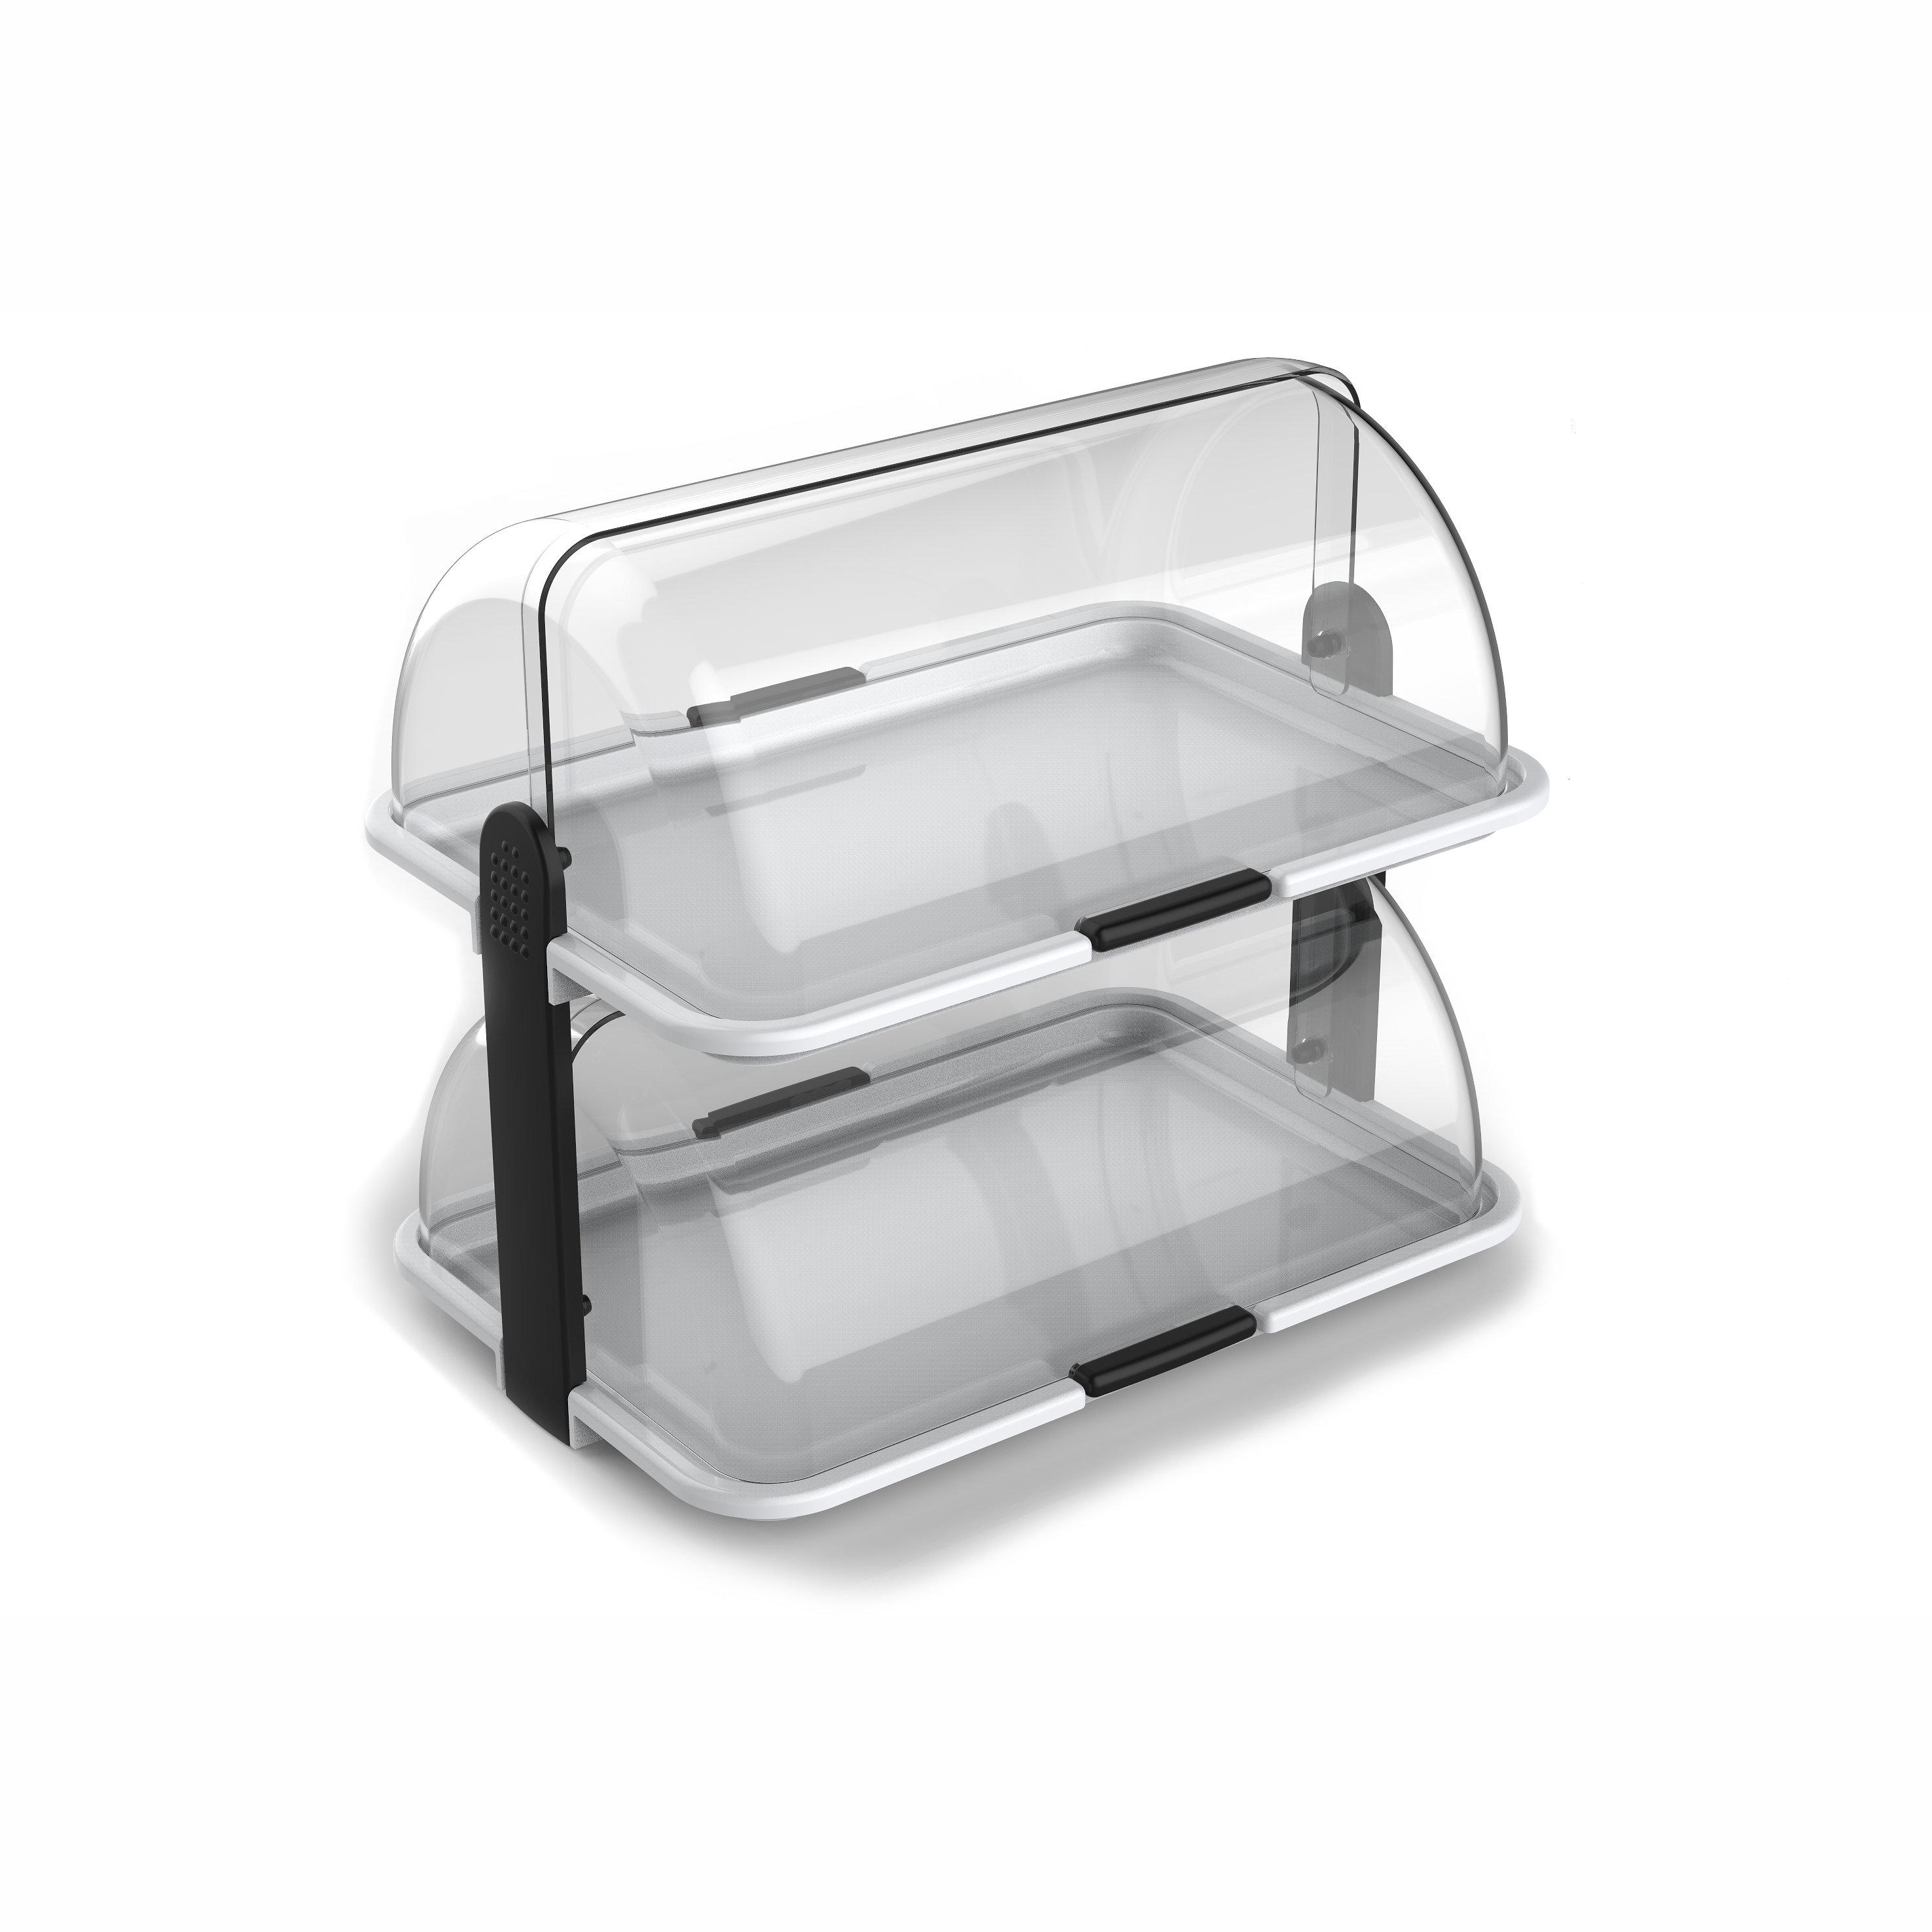 INOX KITCHENWARE   Double-Decker Polybox Countertop Bakery Display ...